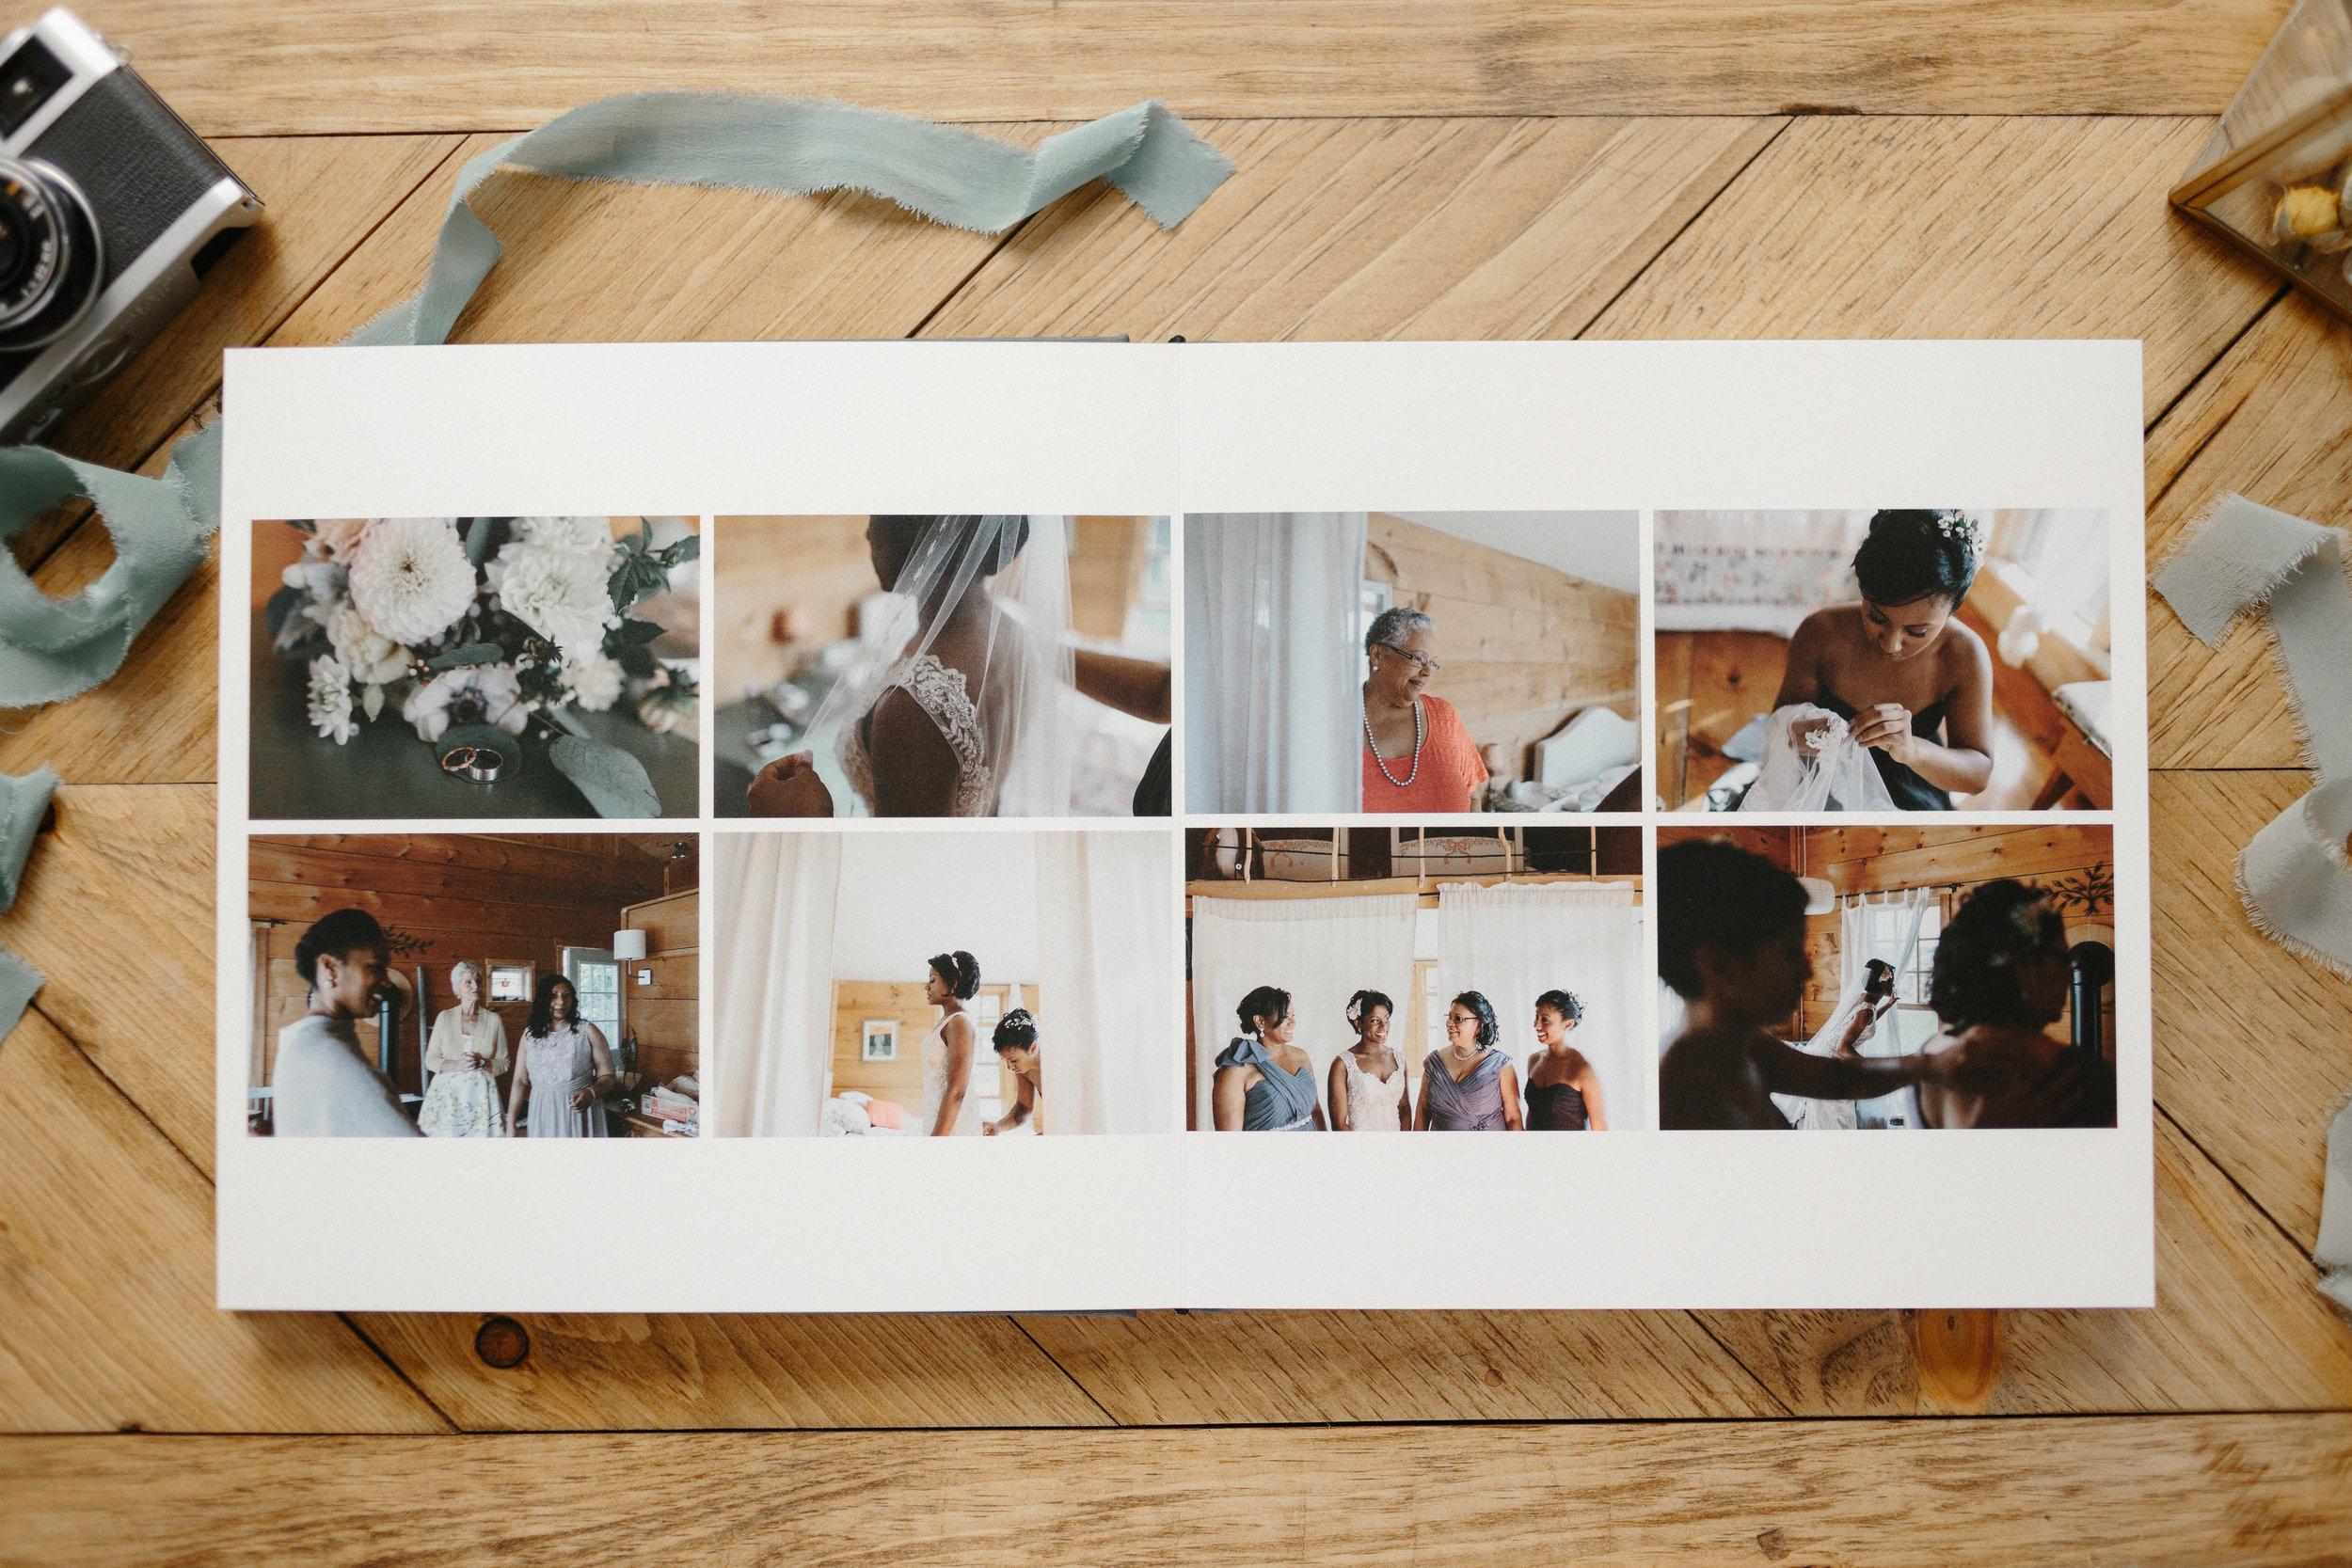 ryanne-hollies-photography-wedding-album-design-details-tono-and-co-artifact-uprising-88.jpg